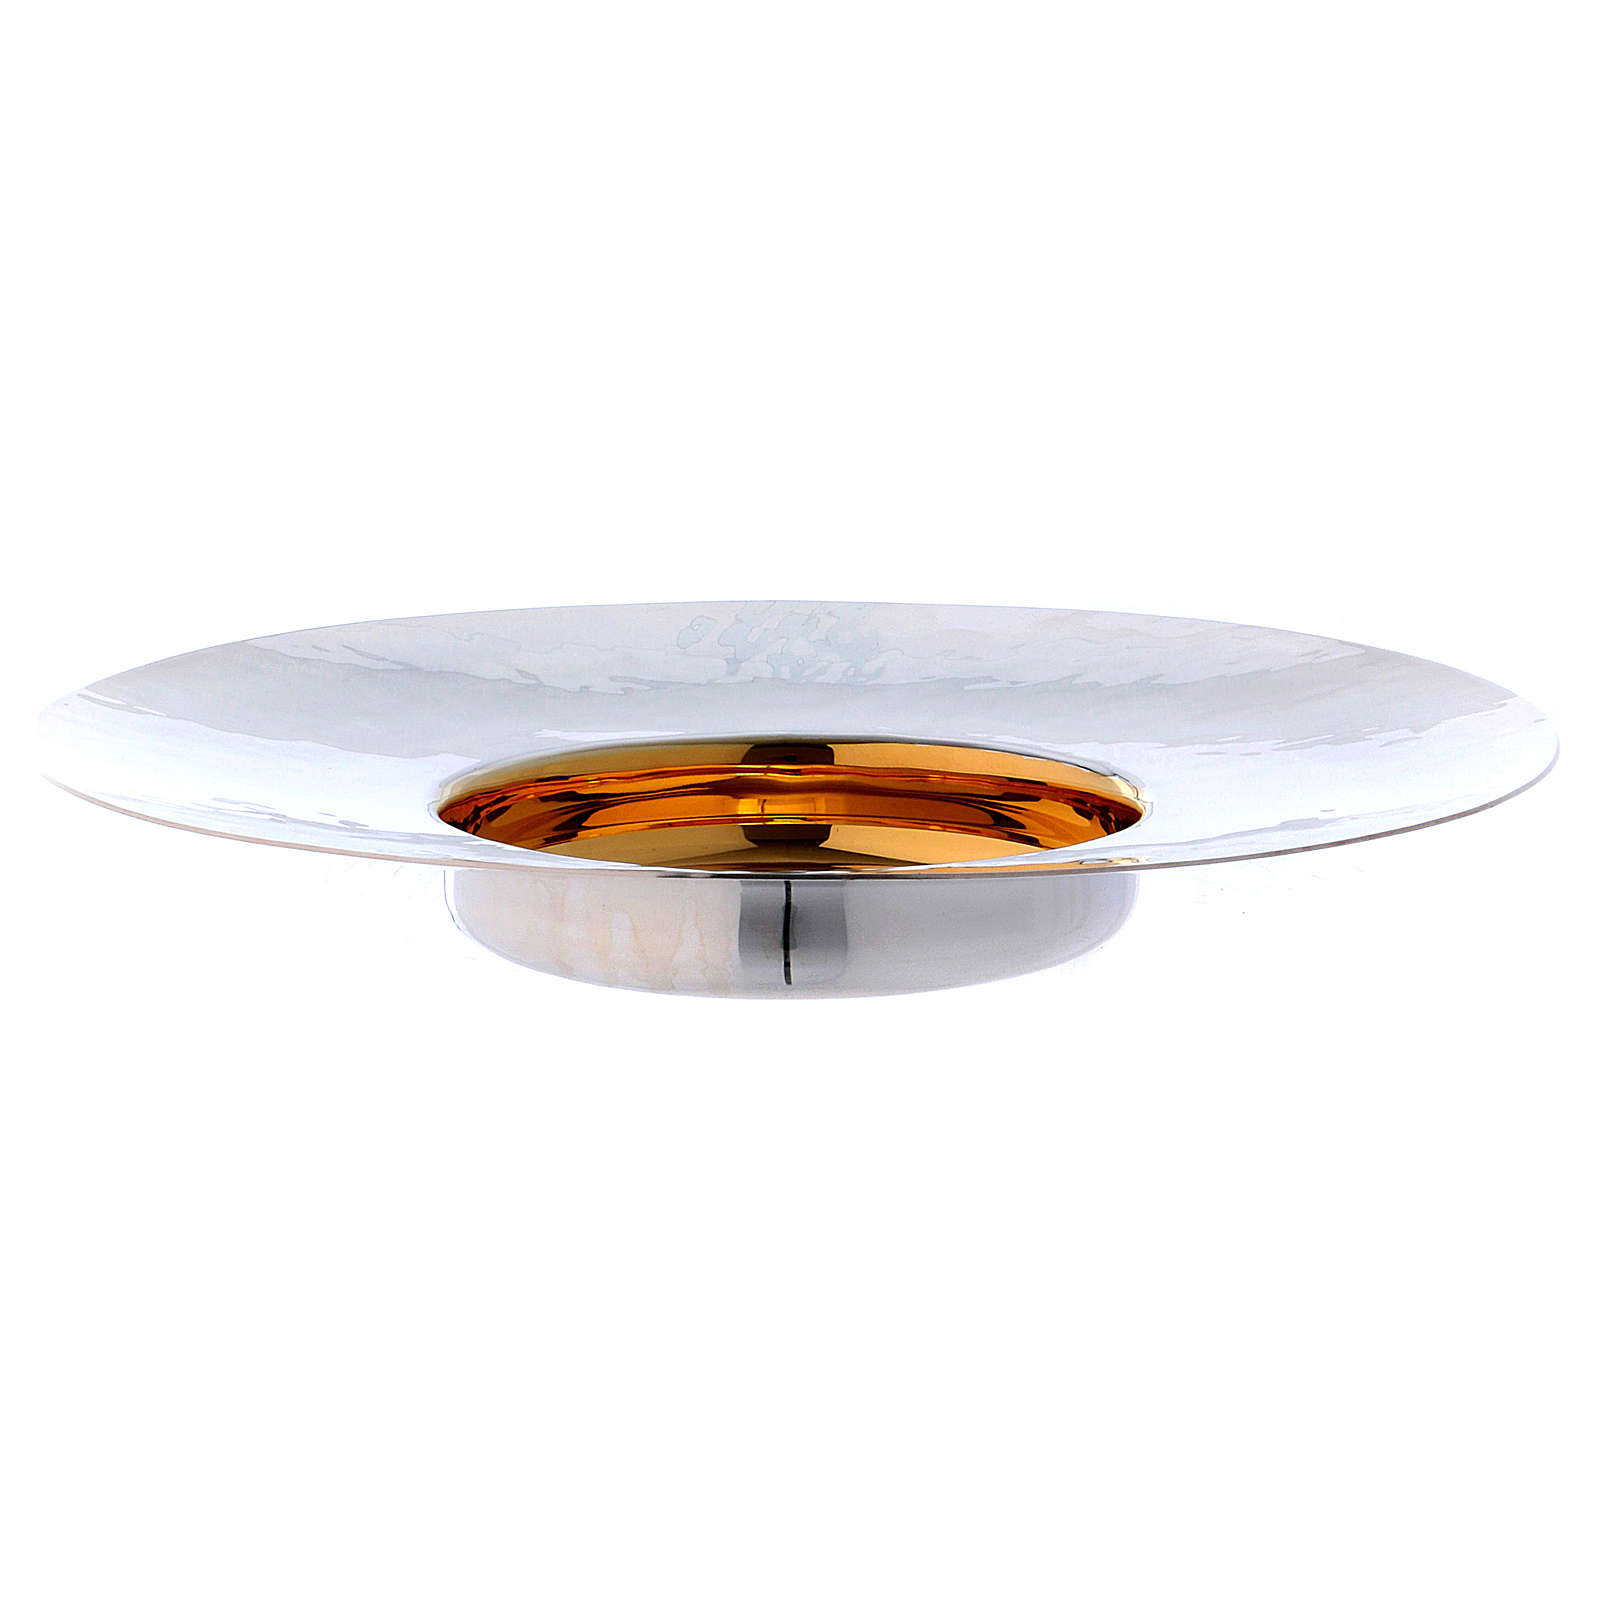 Paten in silver plated metal, Saint Anselm model 4